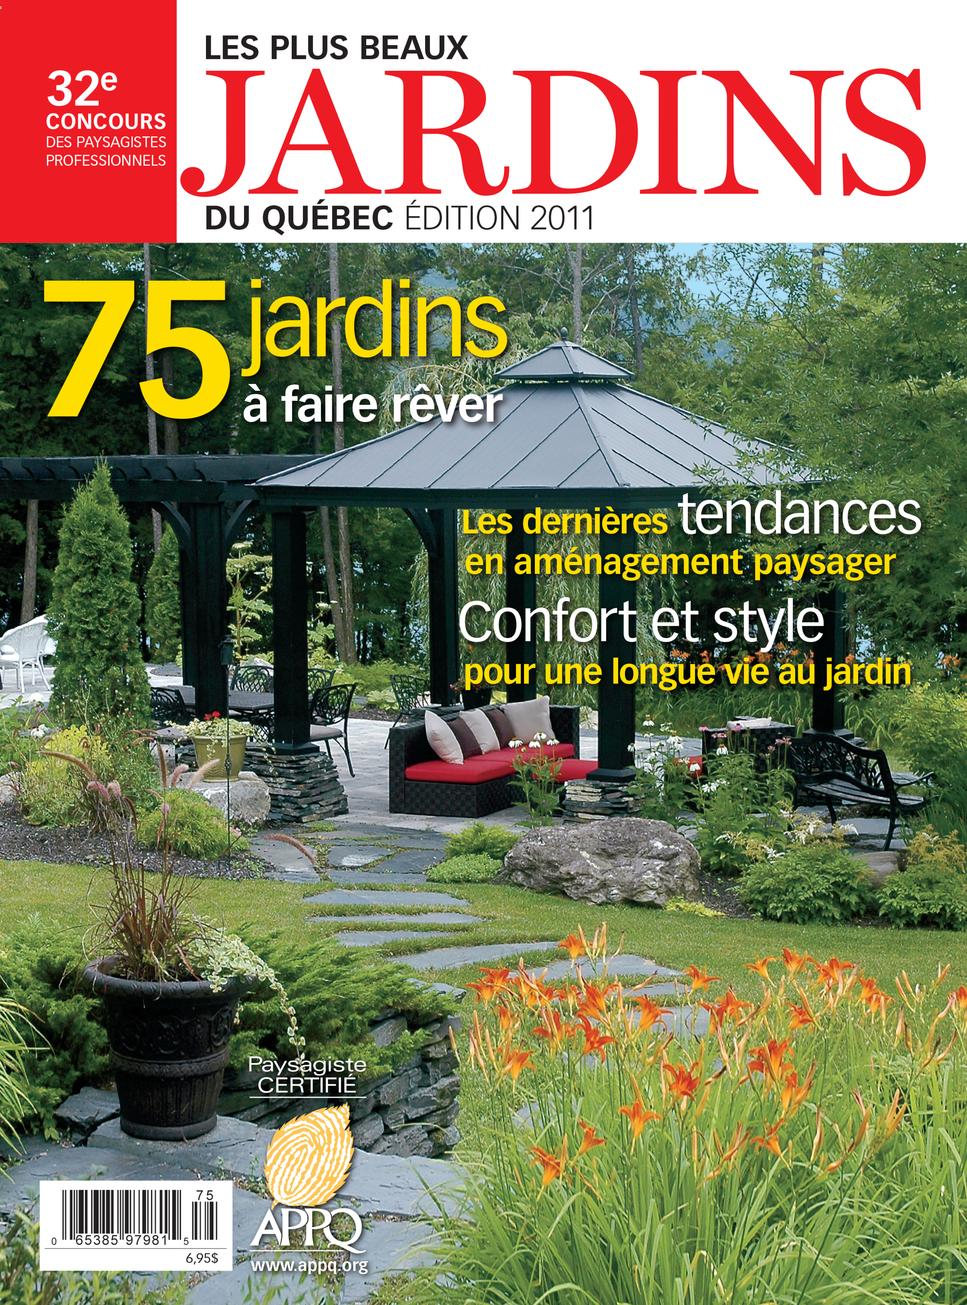 Amenagement Paysager, Jardins, Paysagiste ext rieur de Sherbrooke ...